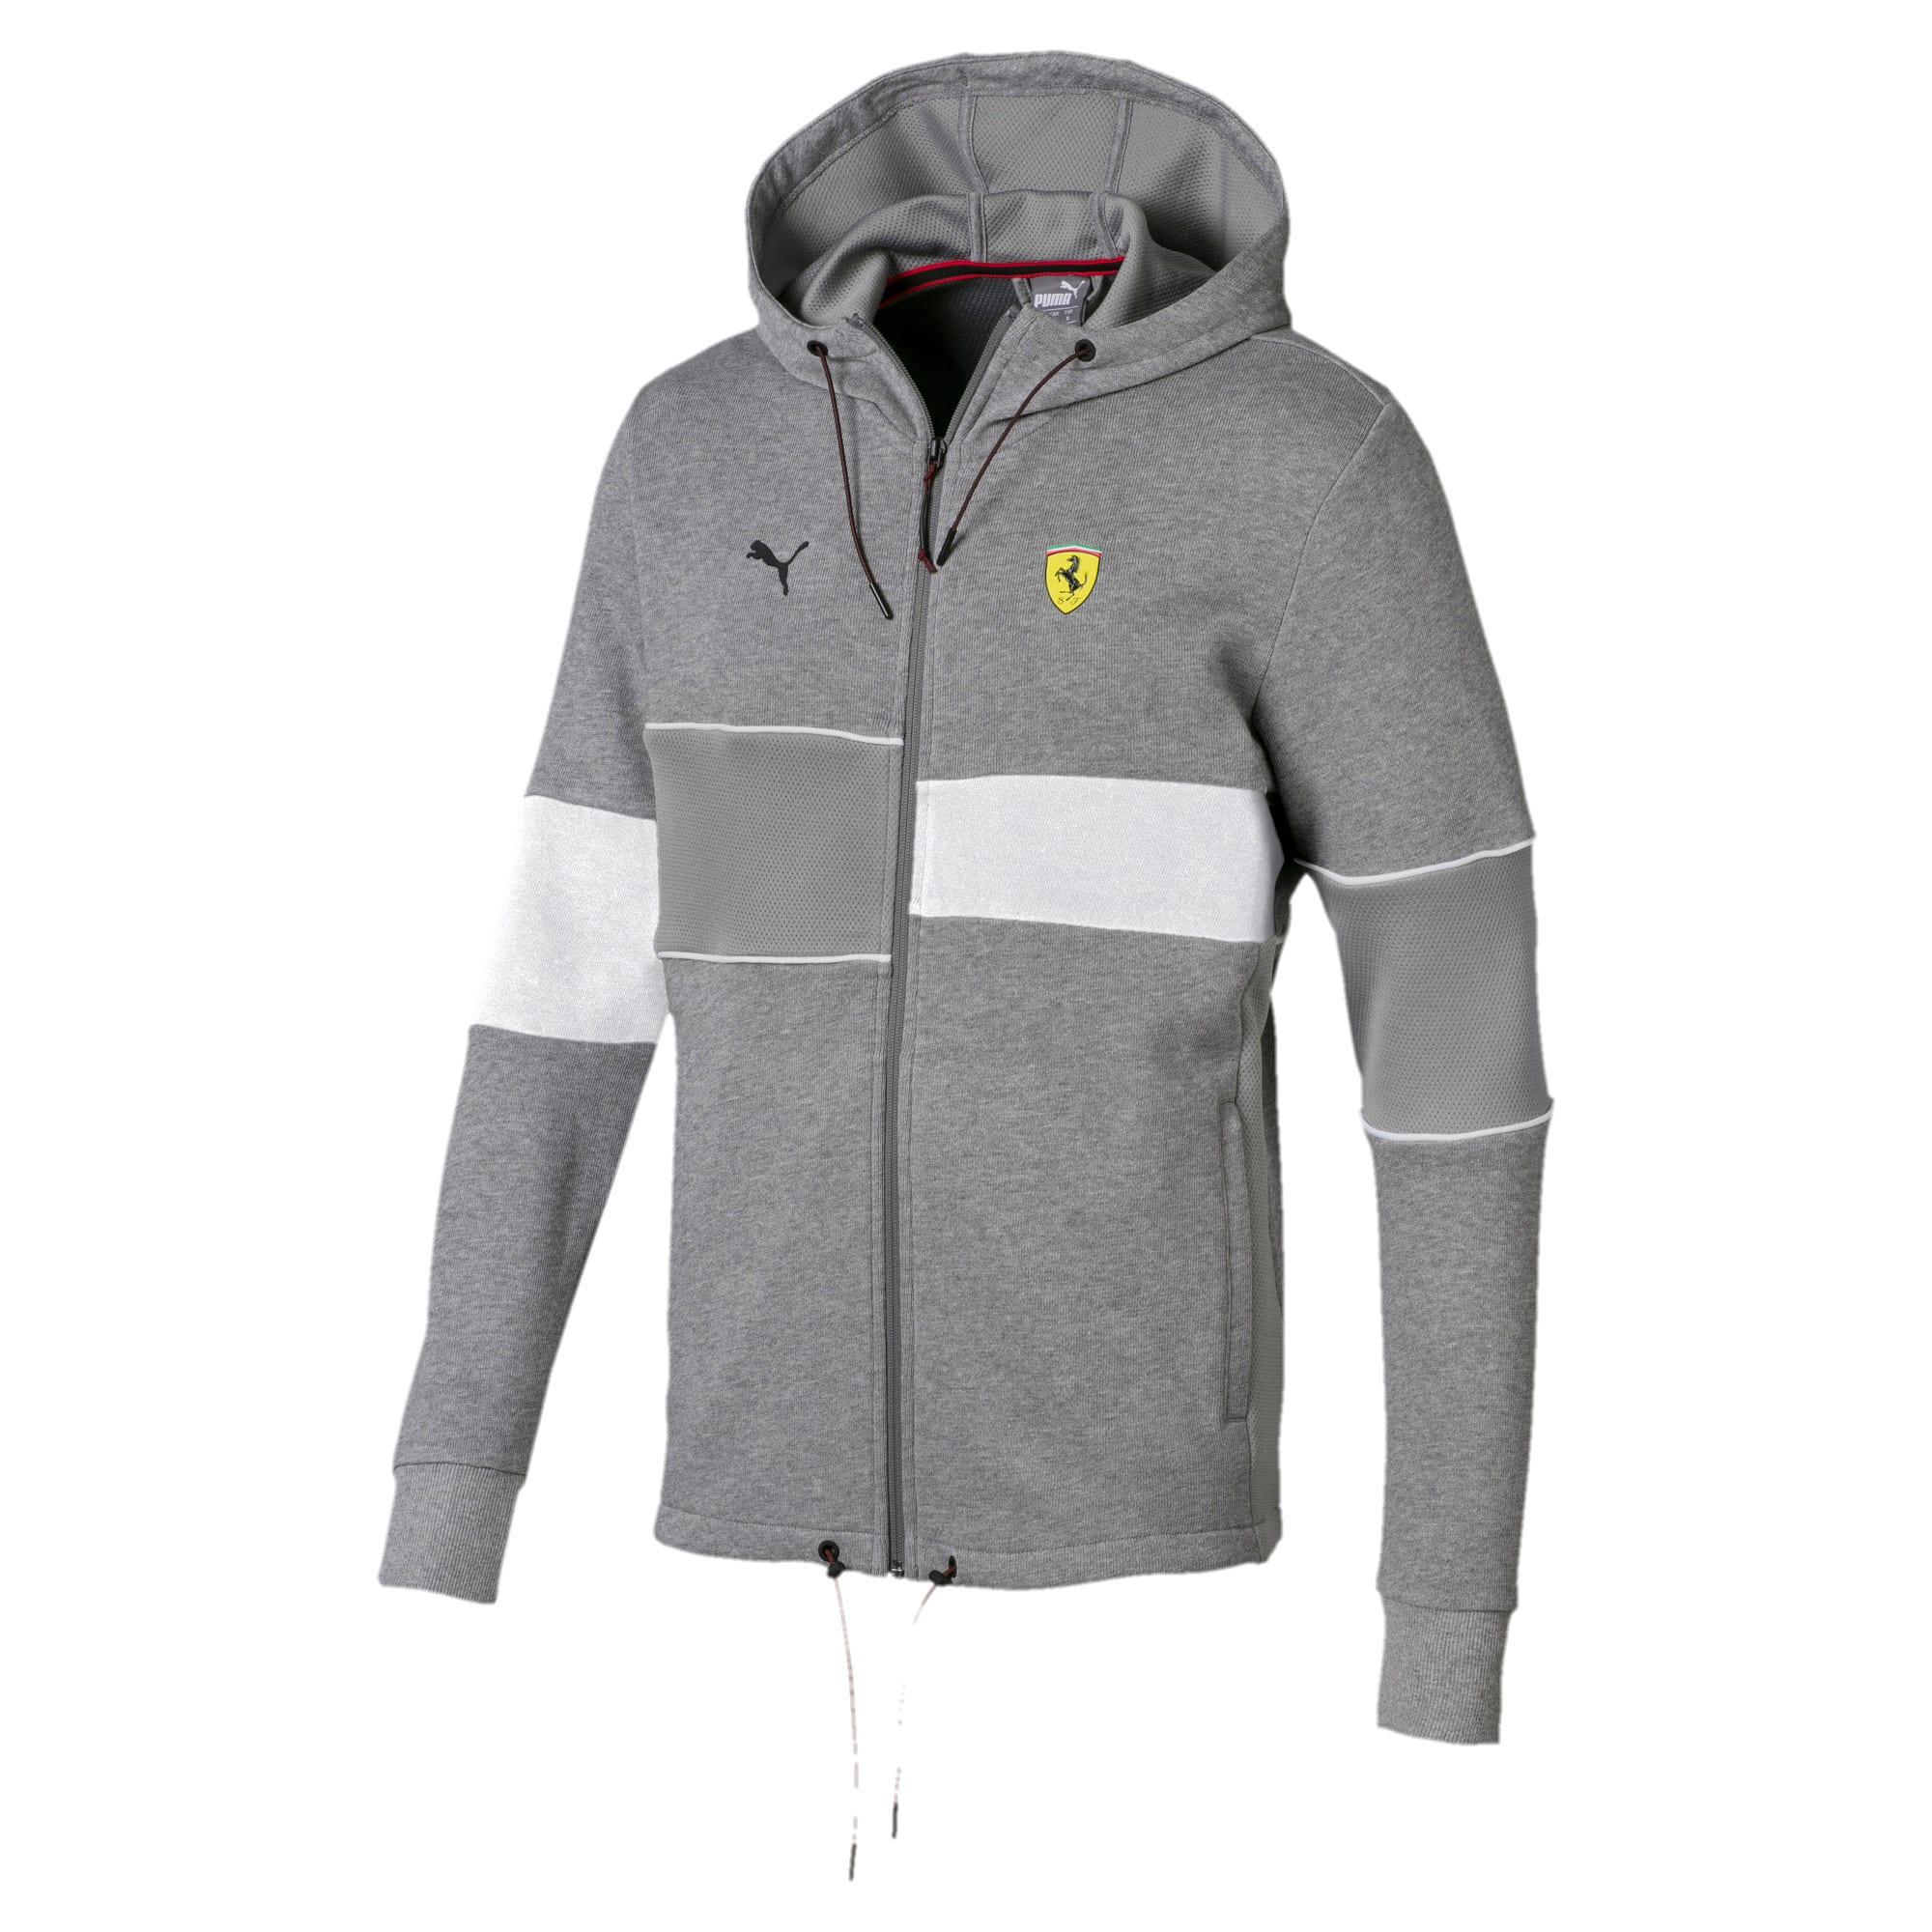 Thumbnail 4 of Ferrari Hooded Zip-Up Men's Jacket, Medium Gray Heather, medium-IND